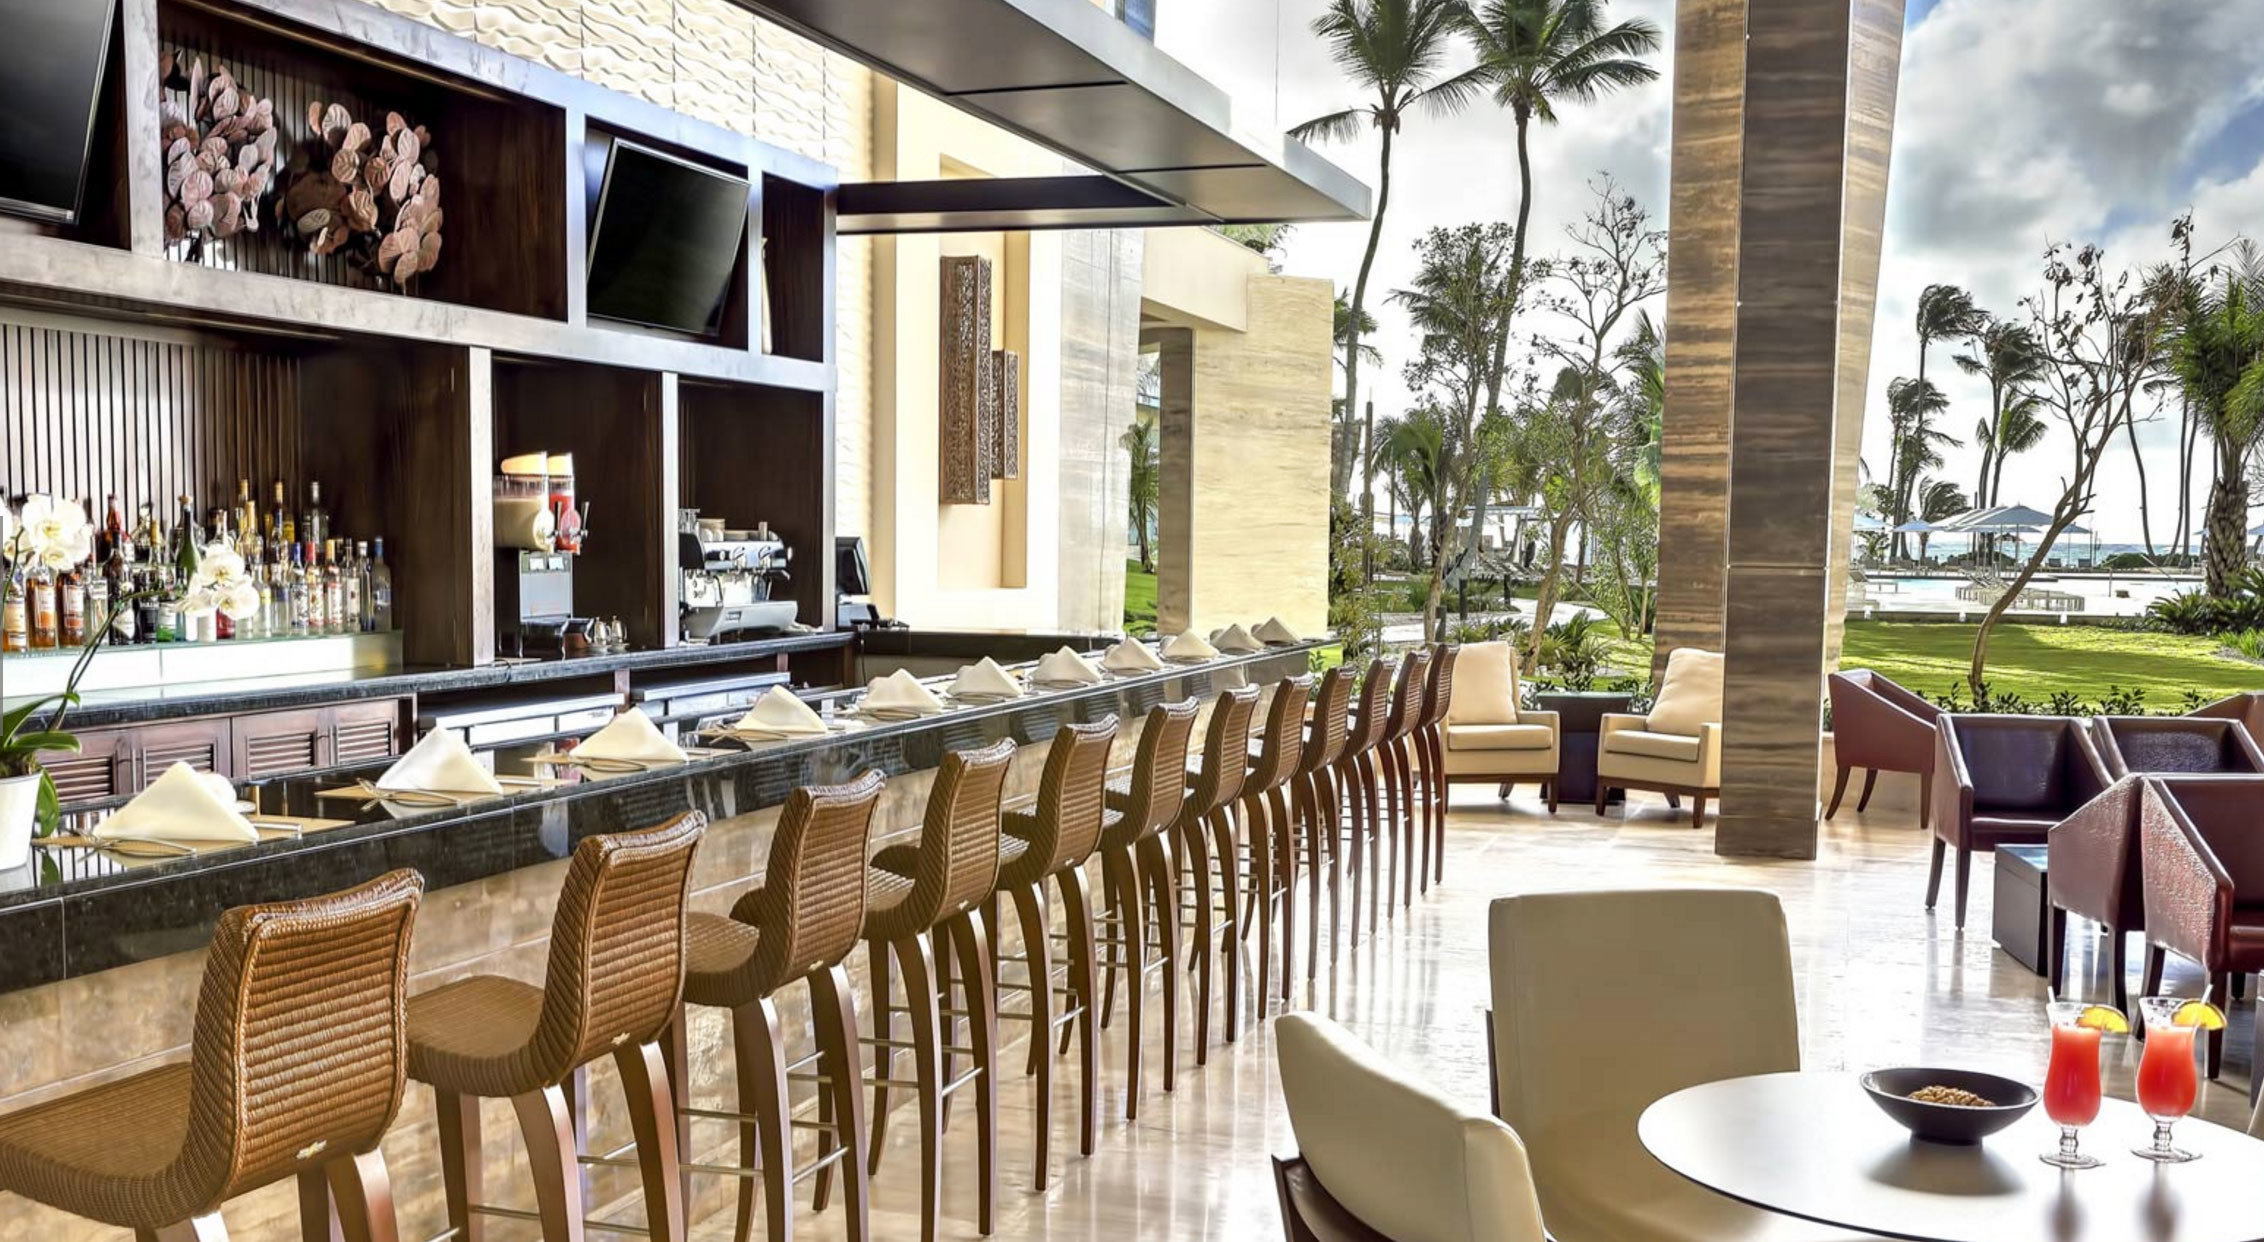 The Westin Puntacana Resort & Club (Punta Cana, Dominican Republic